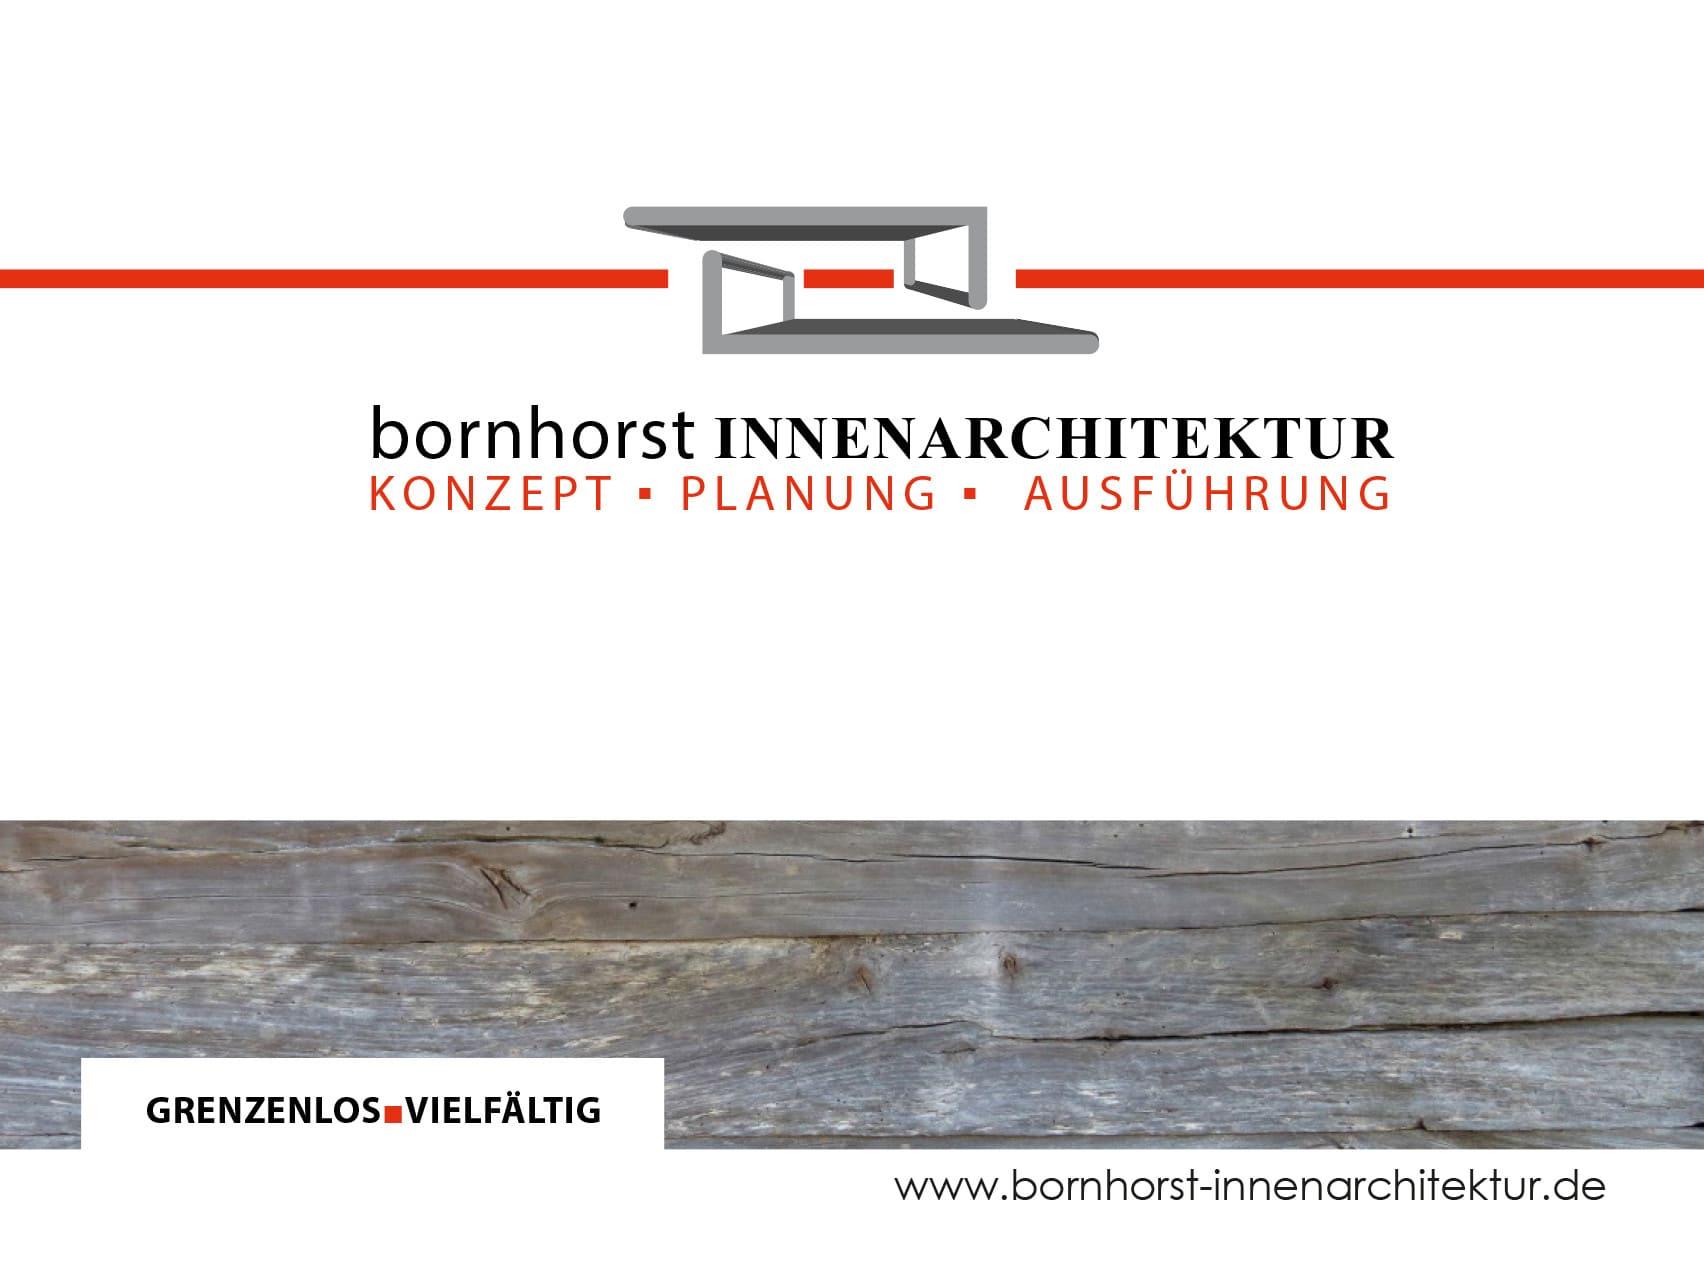 bornhorst INNENARCHITEKTUR — Made in Dinklage